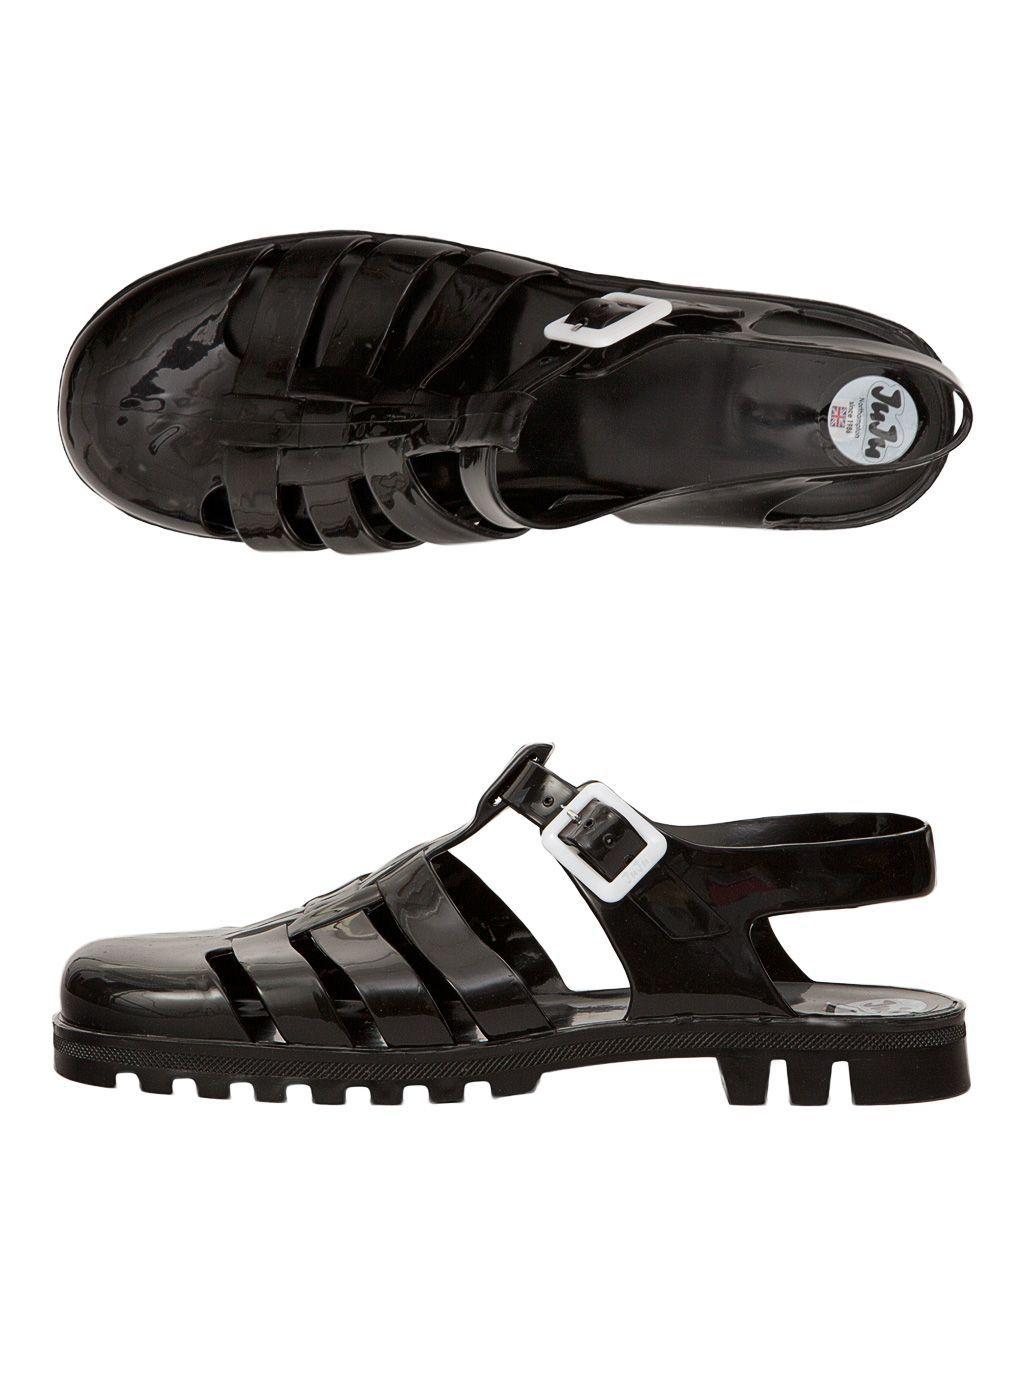 76d5cfe9b3e3 Juju Maxi Jelly Sandals.  AmericanApparel Black Jelly Shoes